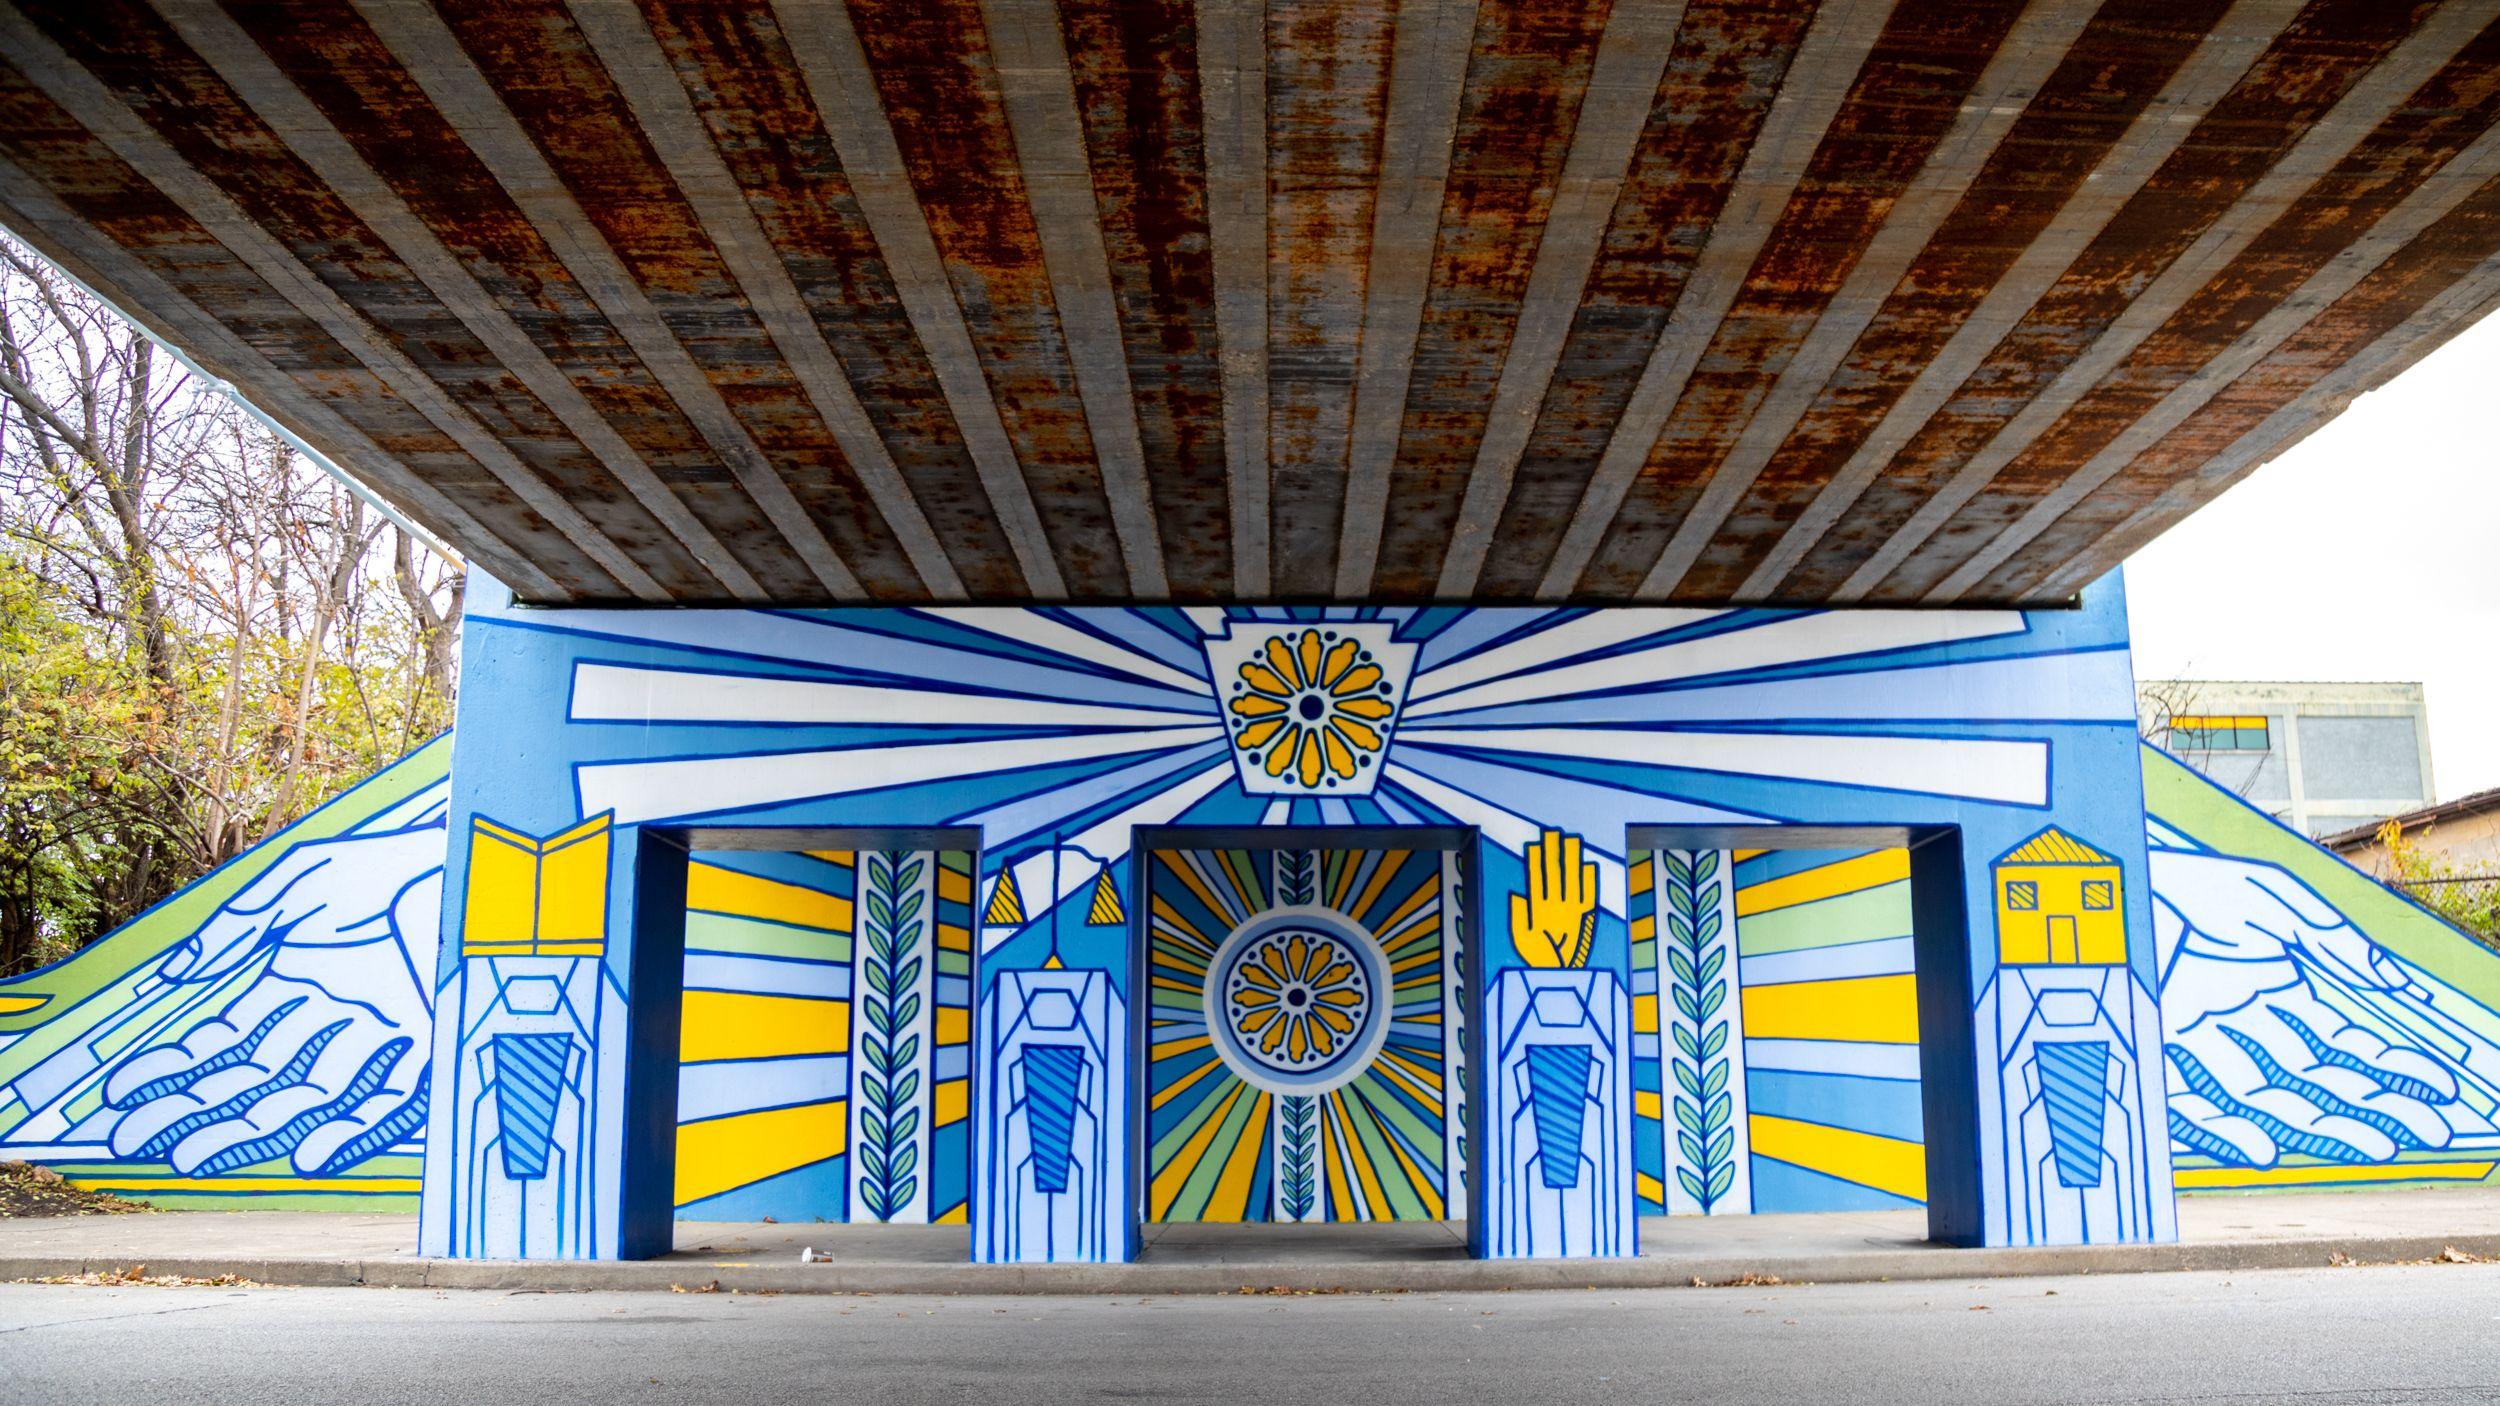 temple-of-community-mural-7.jpg